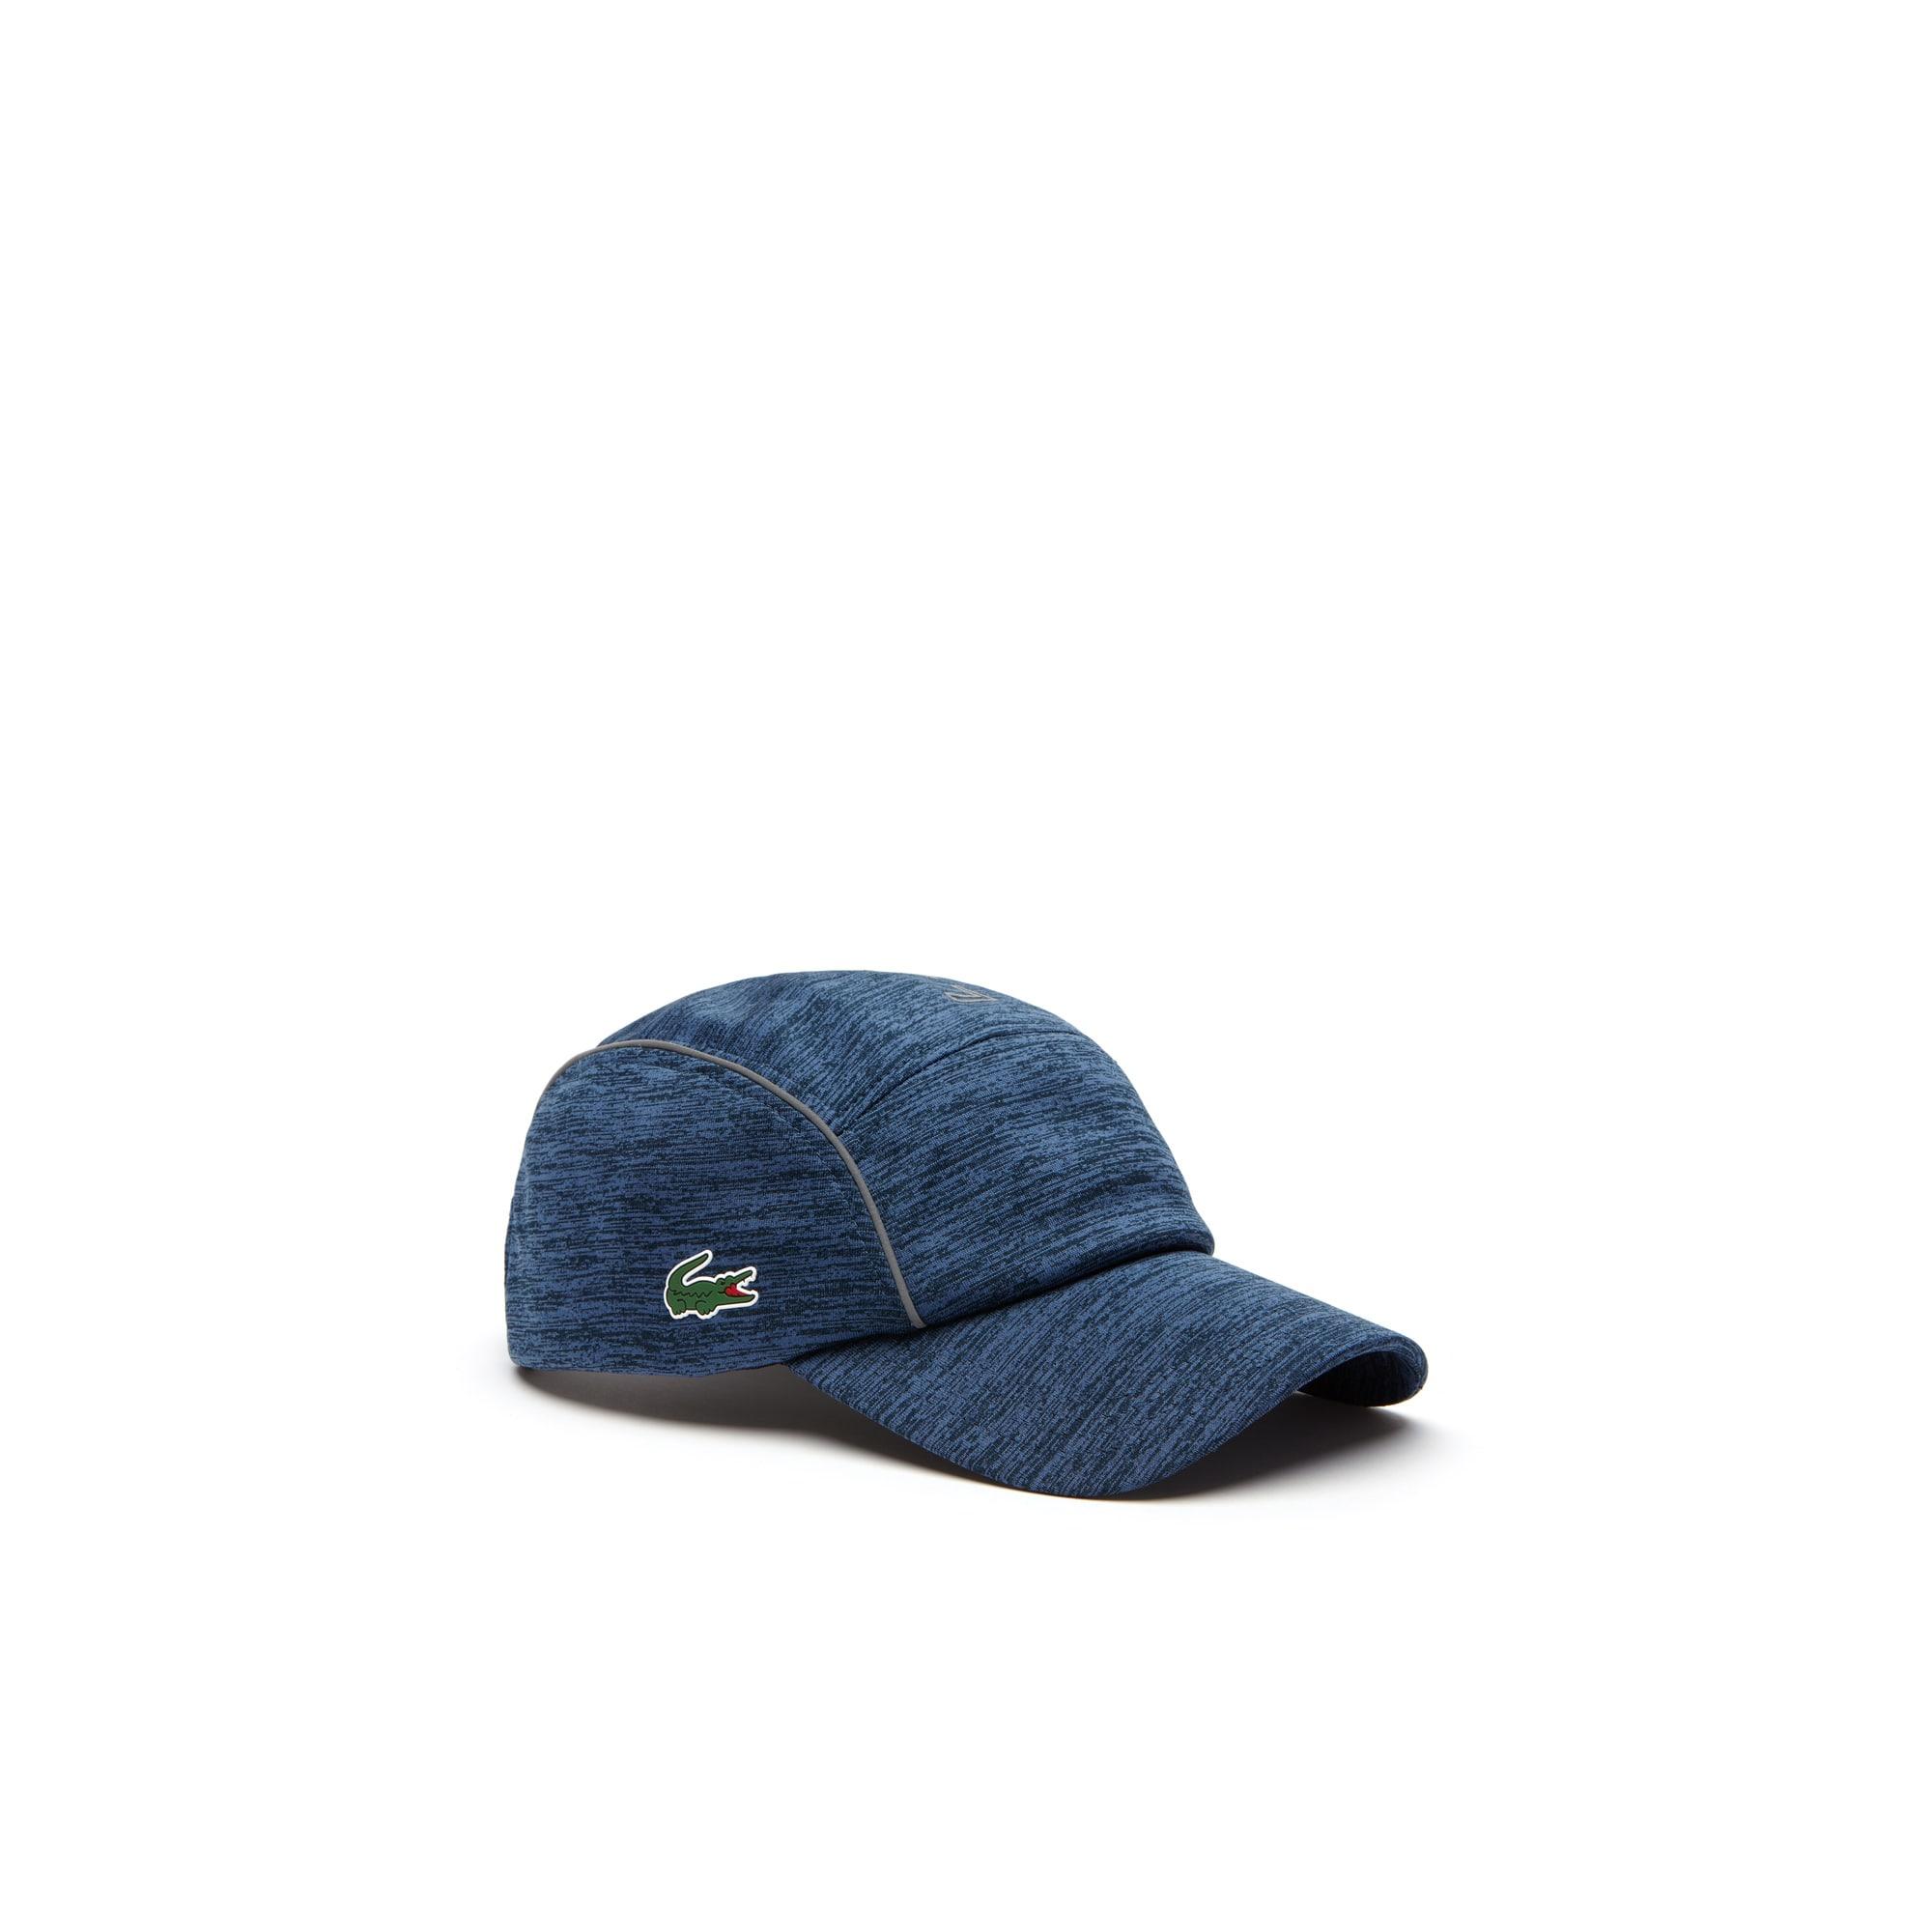 Mens 라코스테 Lacoste SPORT Tennis Jersey & Metallic Mesh Cap,blue / black